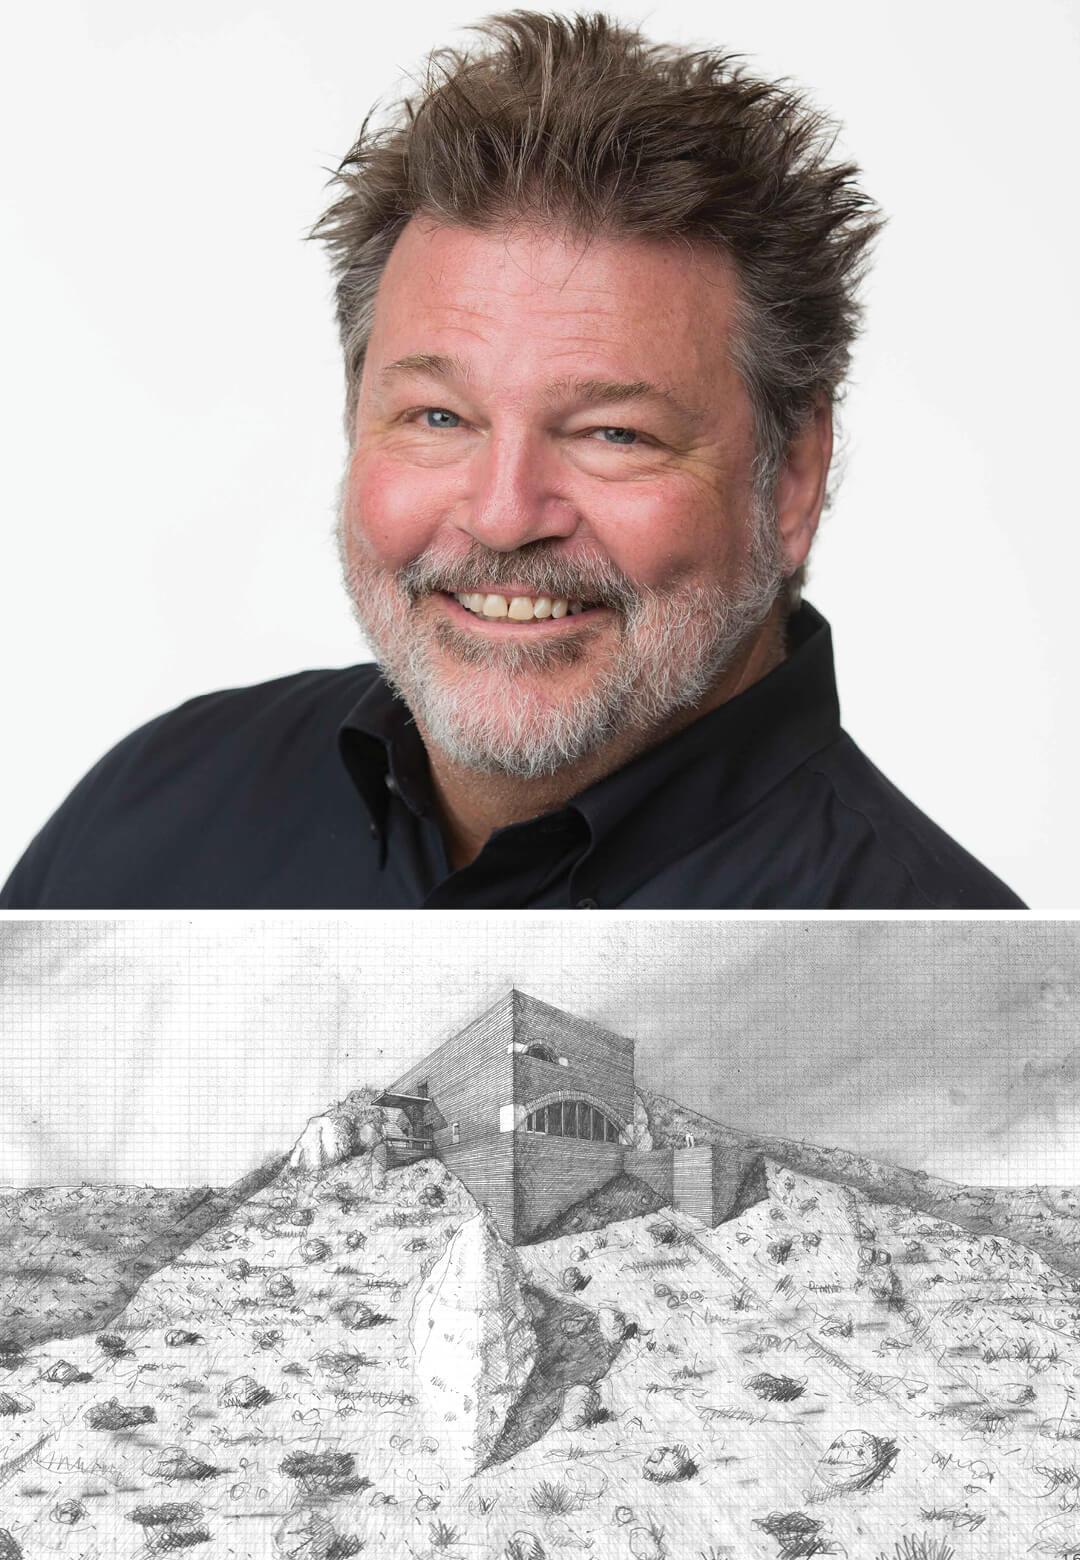 Eddie Jones (left); Crater House, Coconino County, Arizona, 2016 (unbuilt) | In conversation with Eddie Jones | Vladimir Belogolovsky | STIRworld